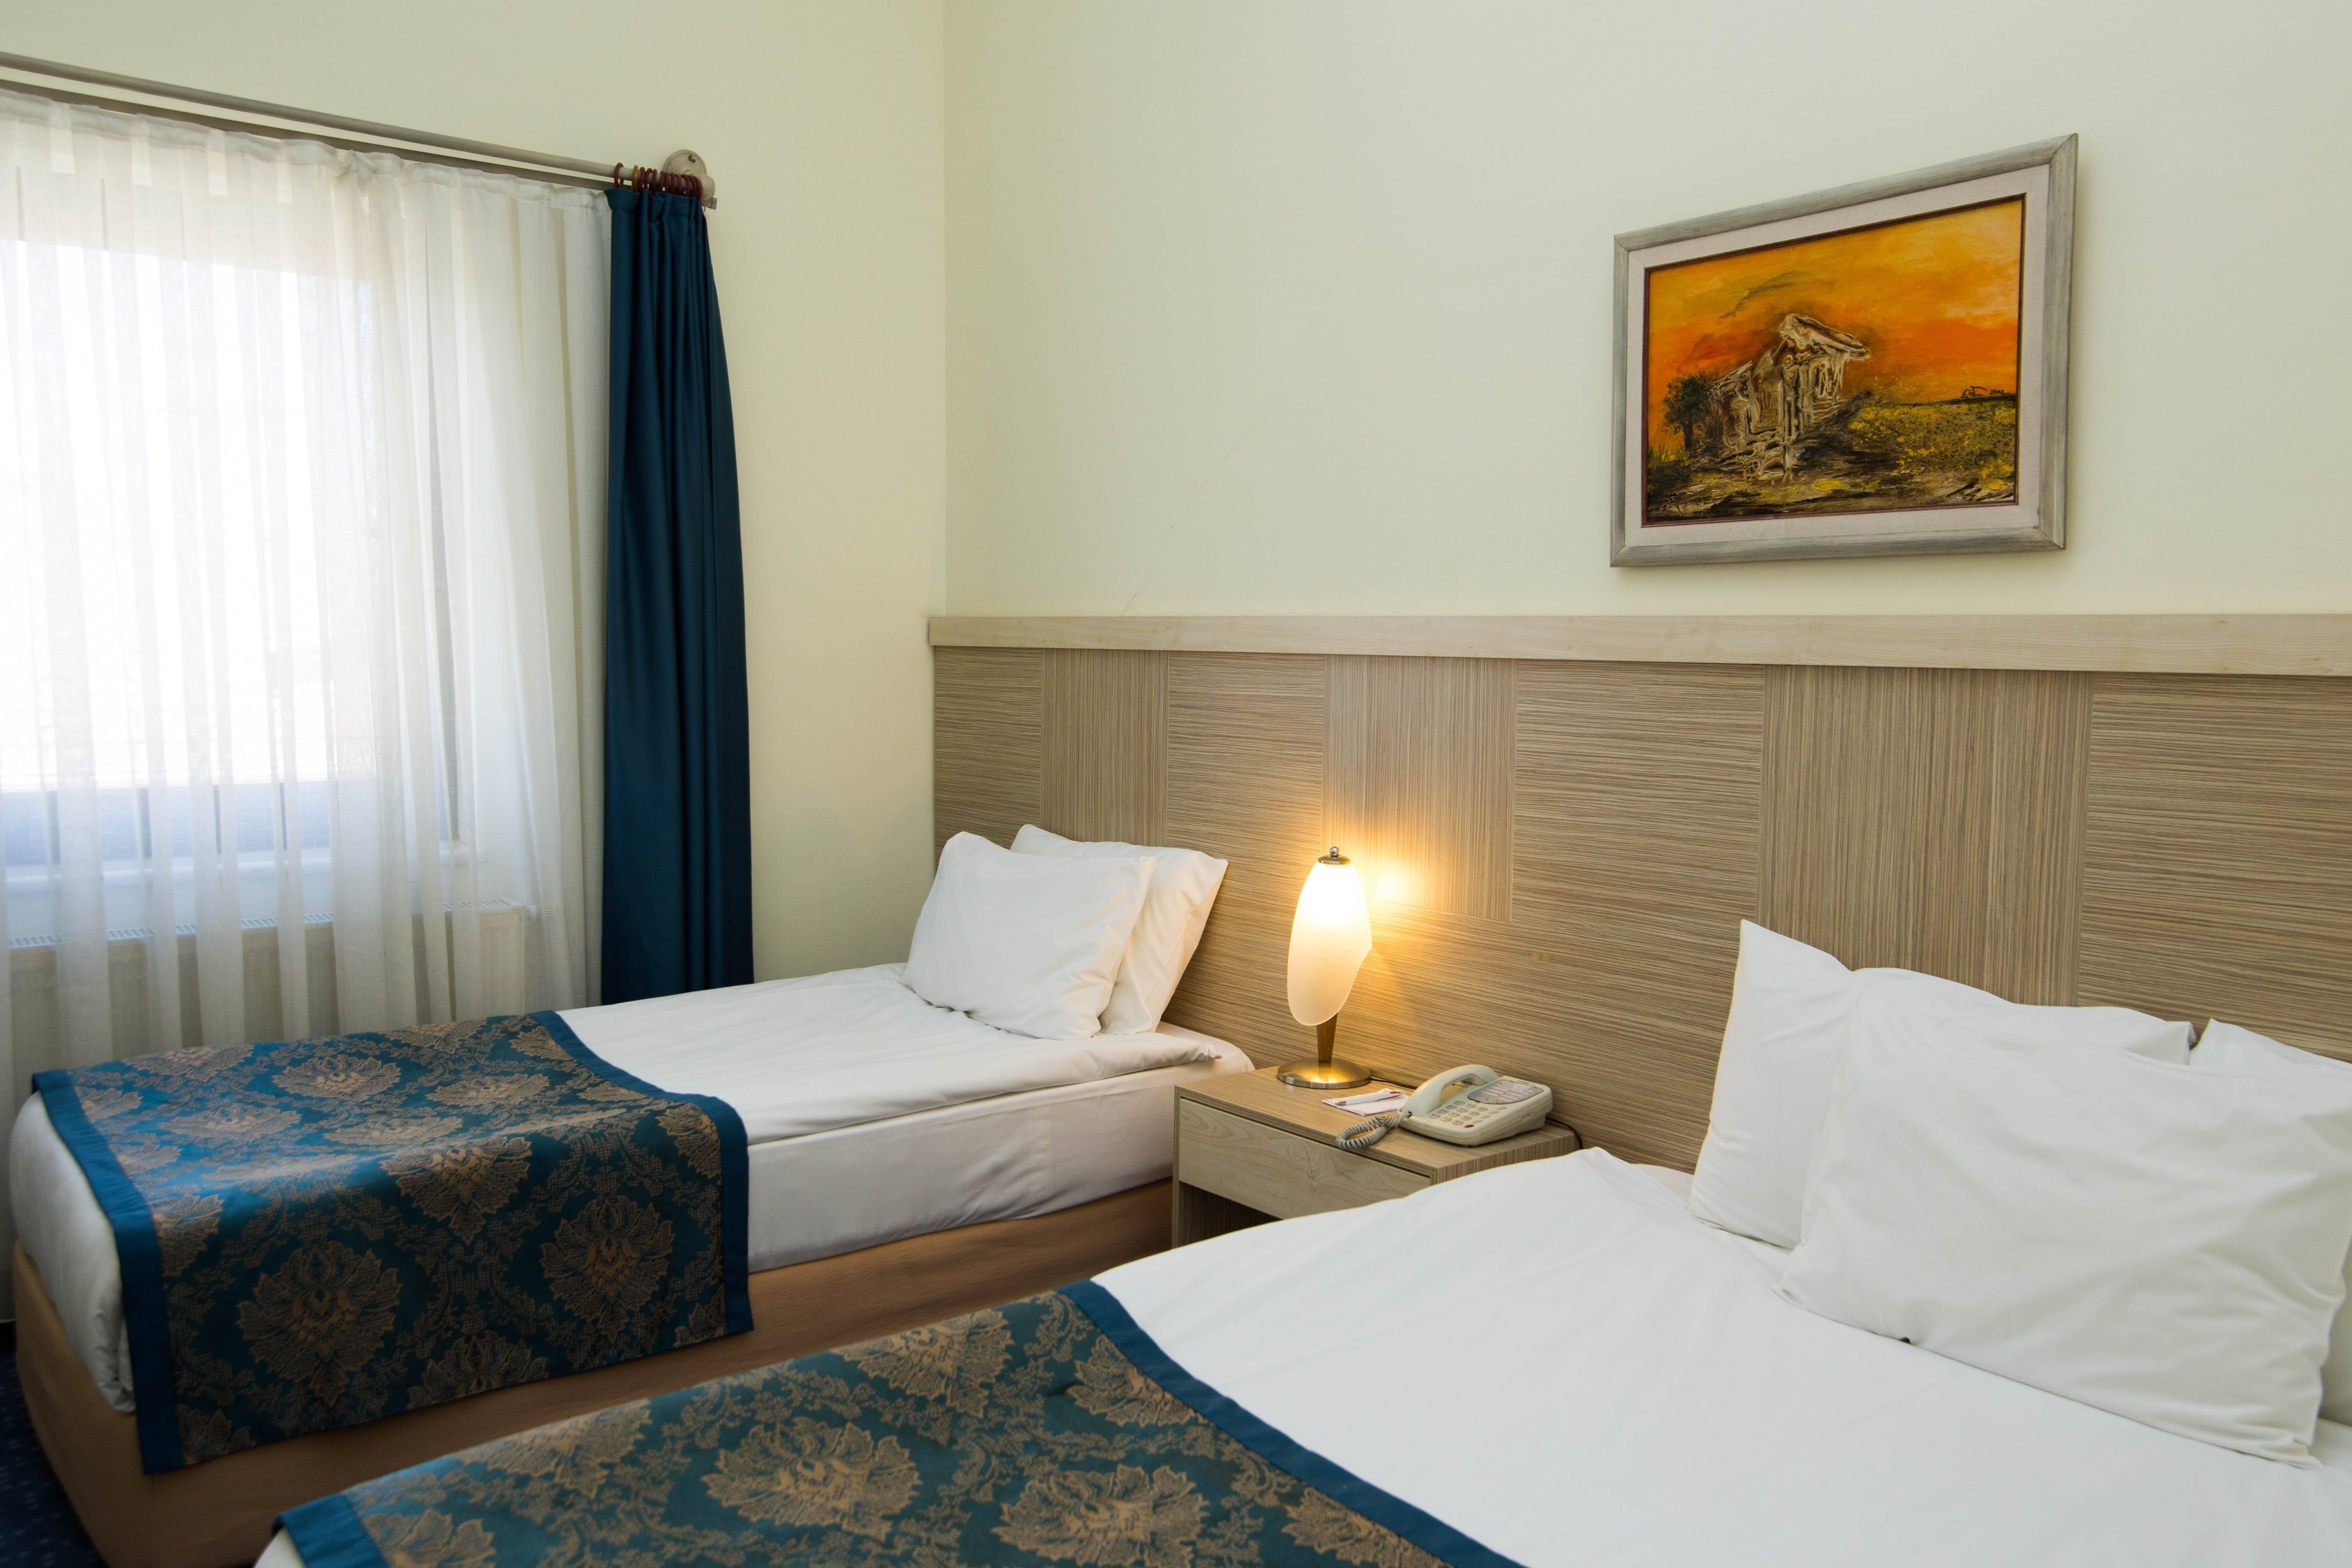 King Otel Çankaya, Ankara, Çankaya, 23343